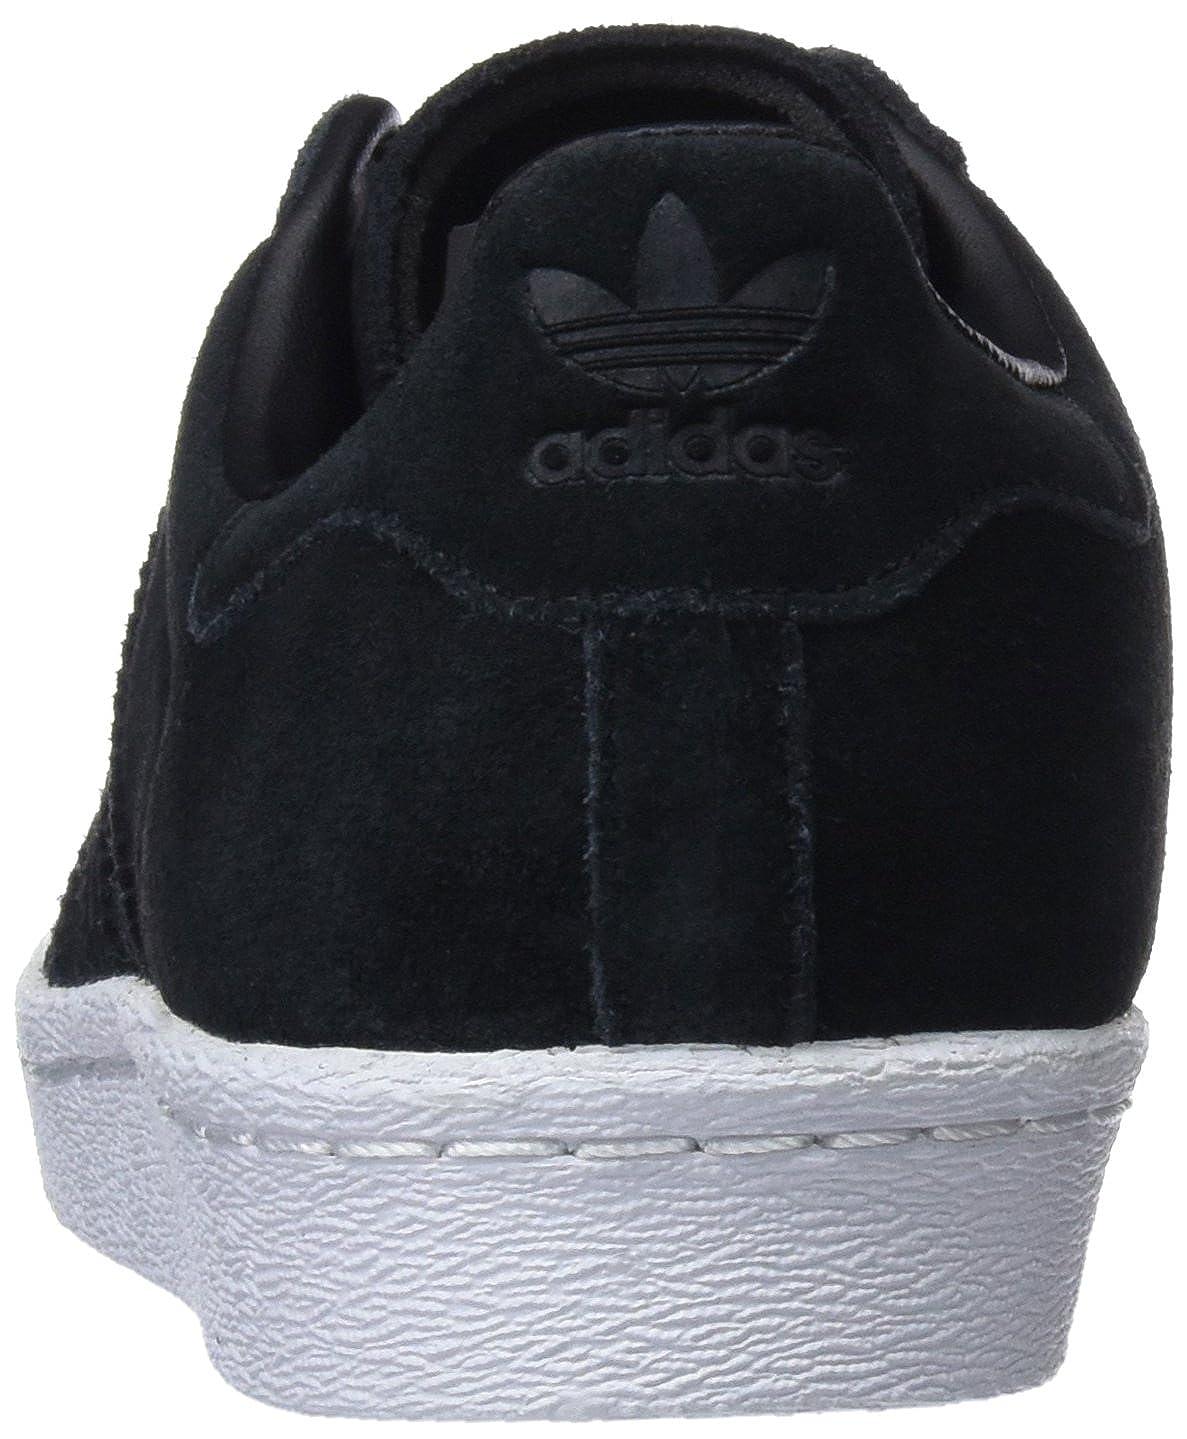 Adidas Adidas Adidas Damen Superstar 80s Mt W Gymnastikschuhe  8222e2